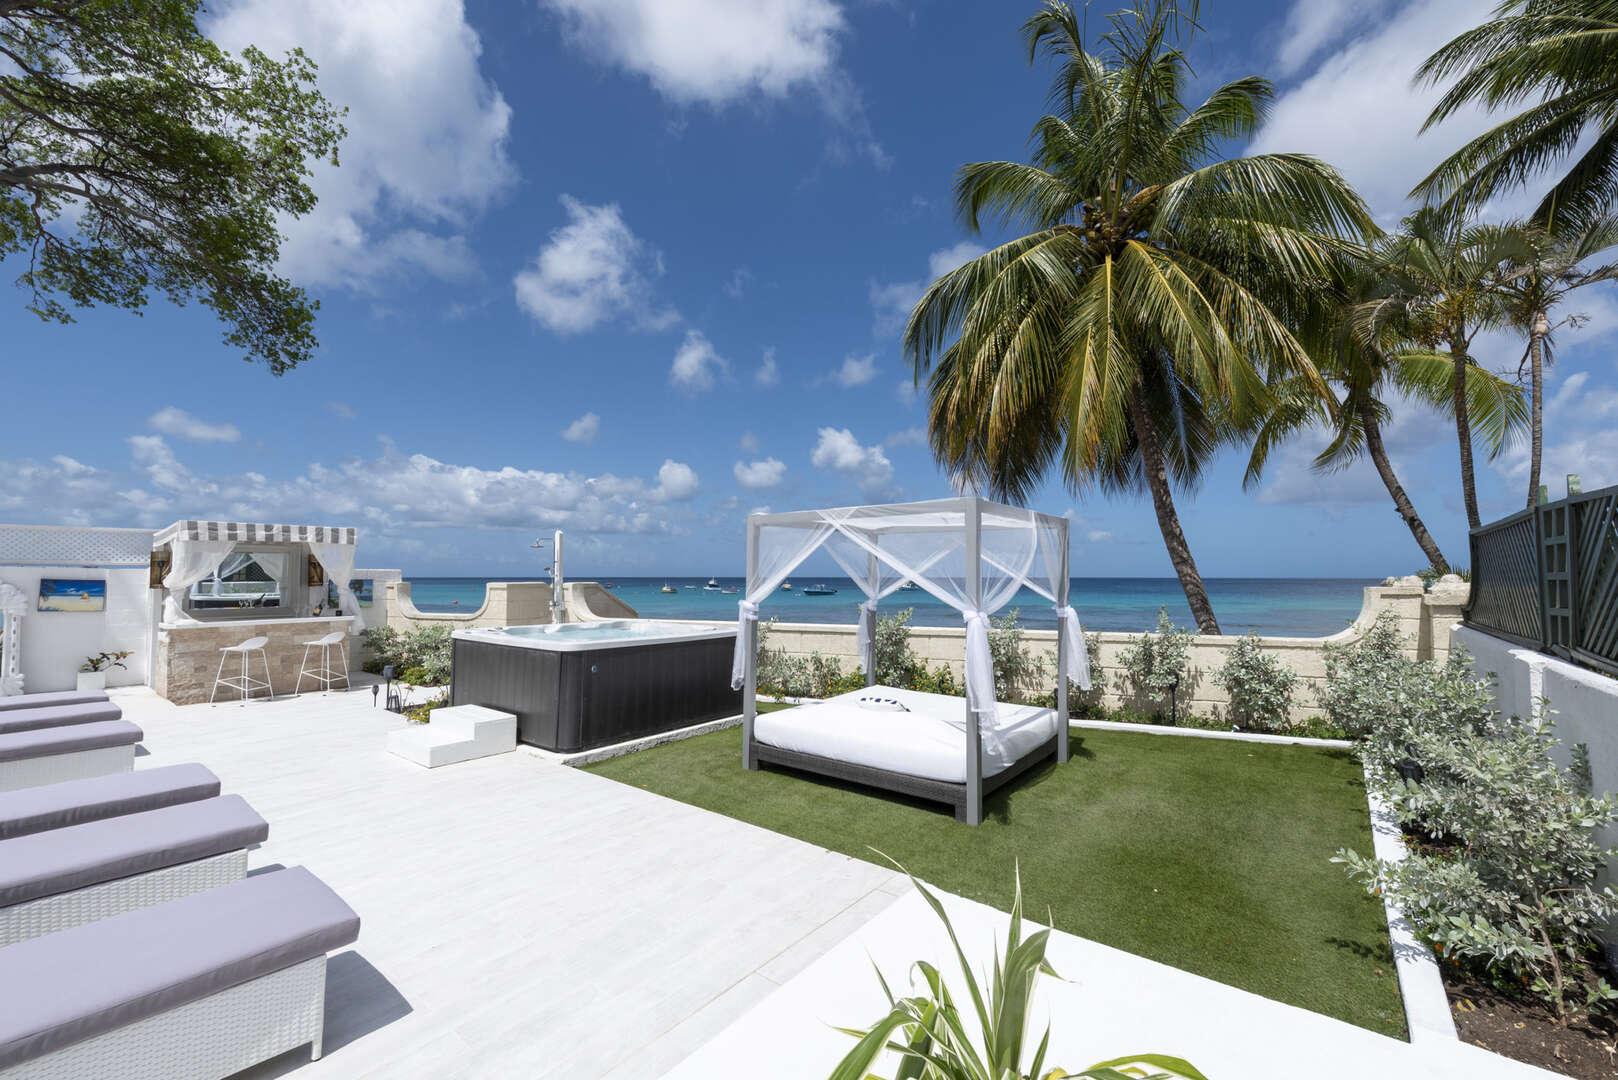 - Solaris Beach House - Image 1/16